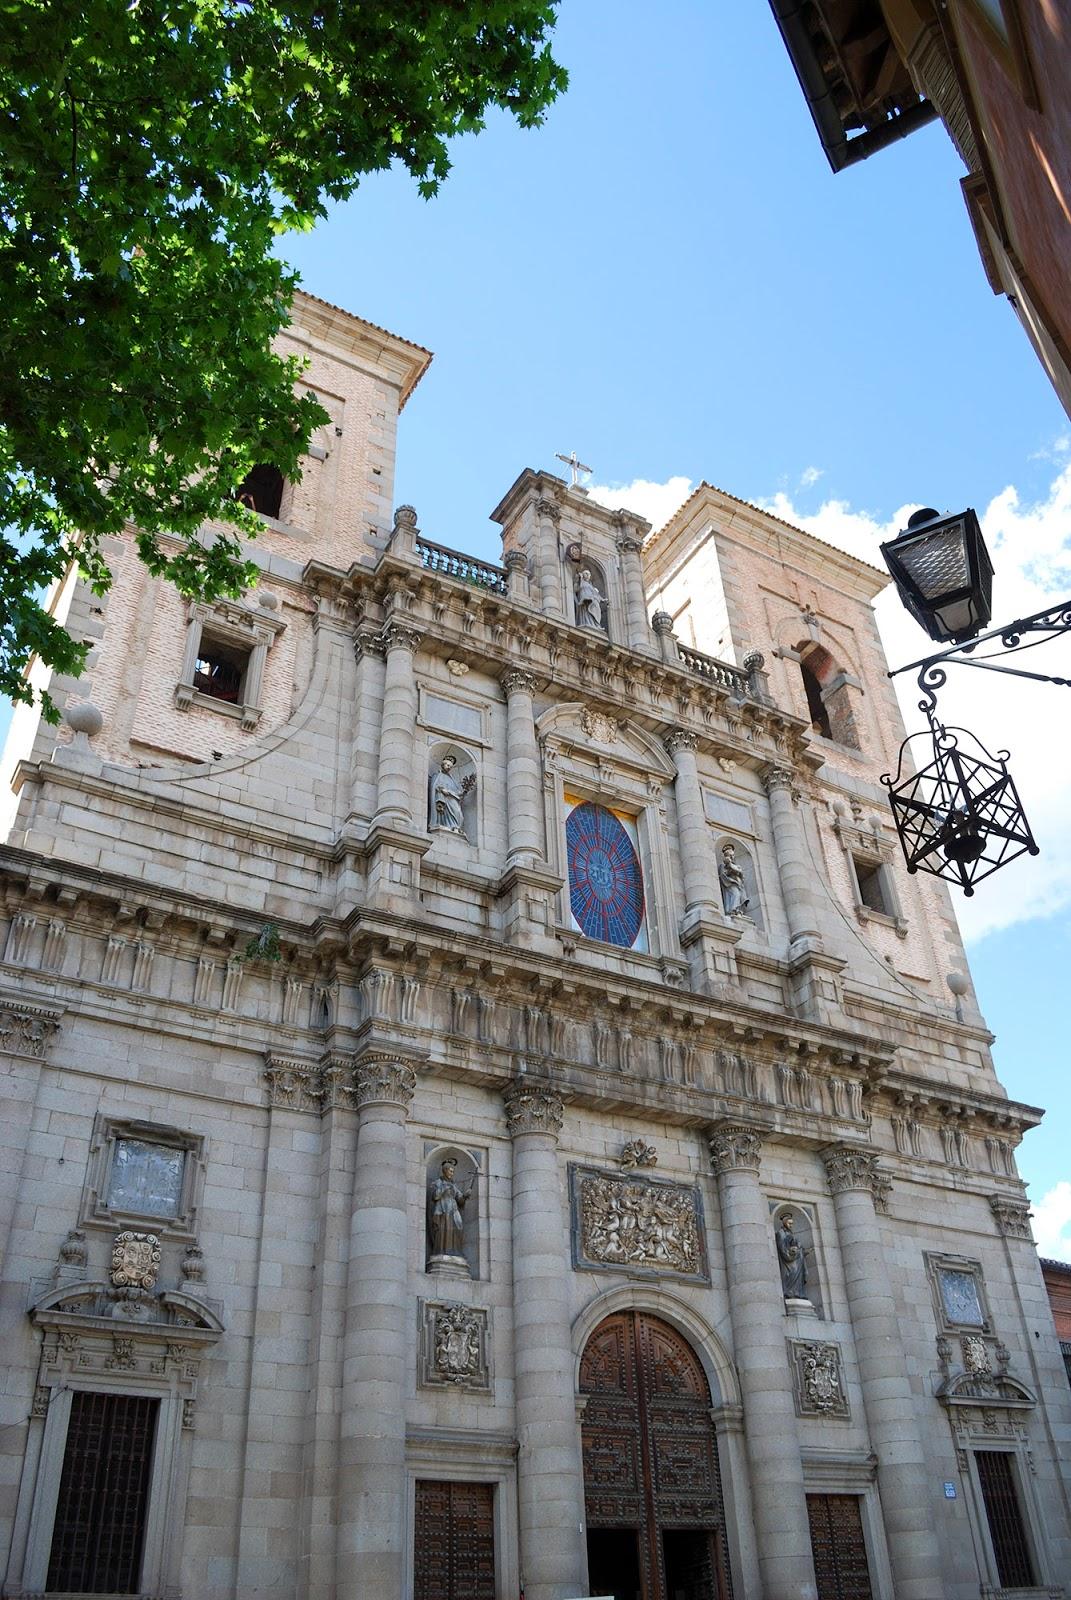 church basilica religious heritage toledo spain landmark history travel guide tourism day trip itinerary